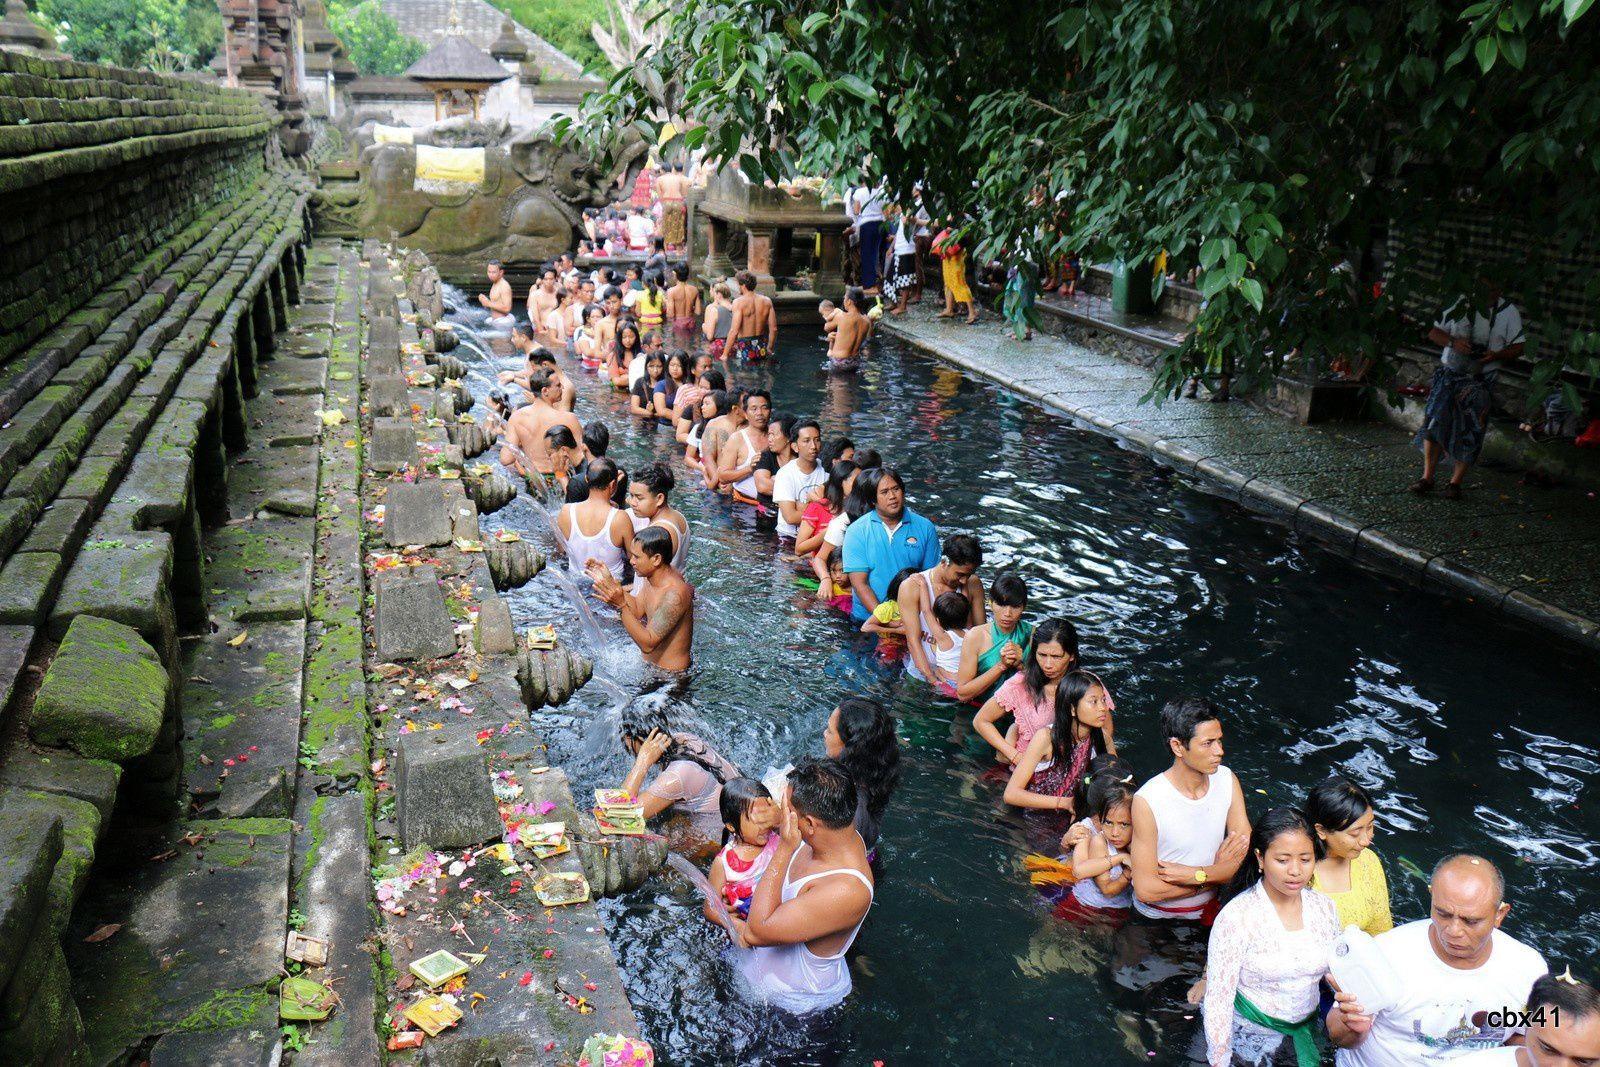 La source sacrée du temple de Tirta Empul, Tampaksiring (Bali, Indonésie)